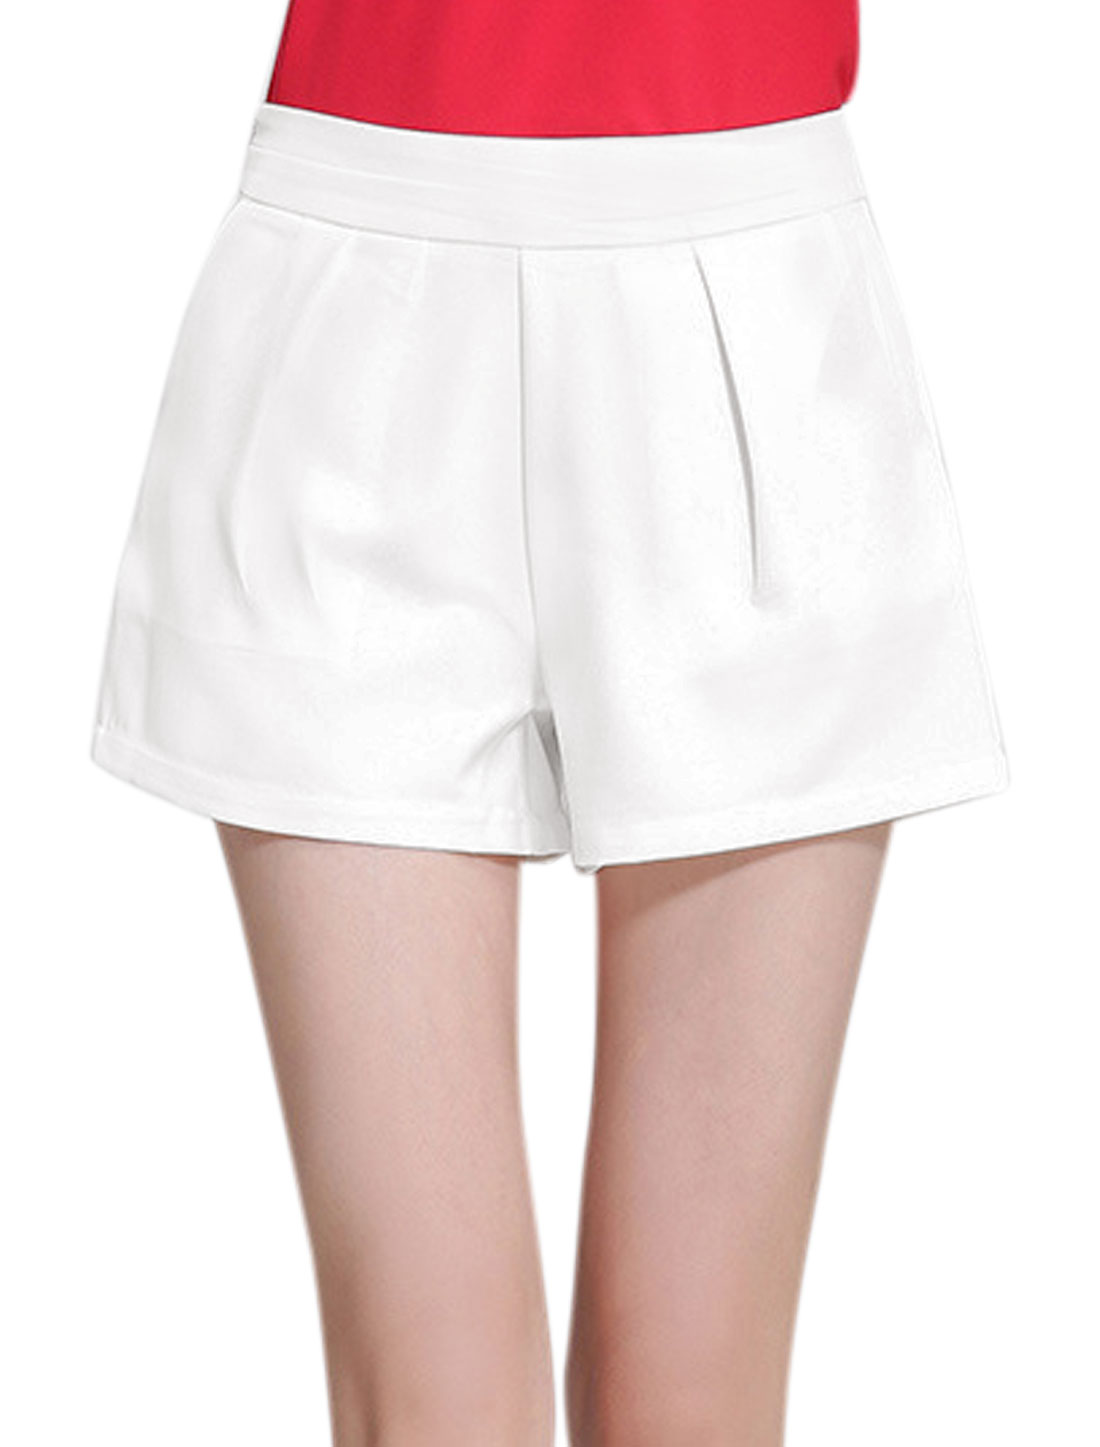 Women High Rise Hidden Zipper Side Slant Pockets Shorts White L